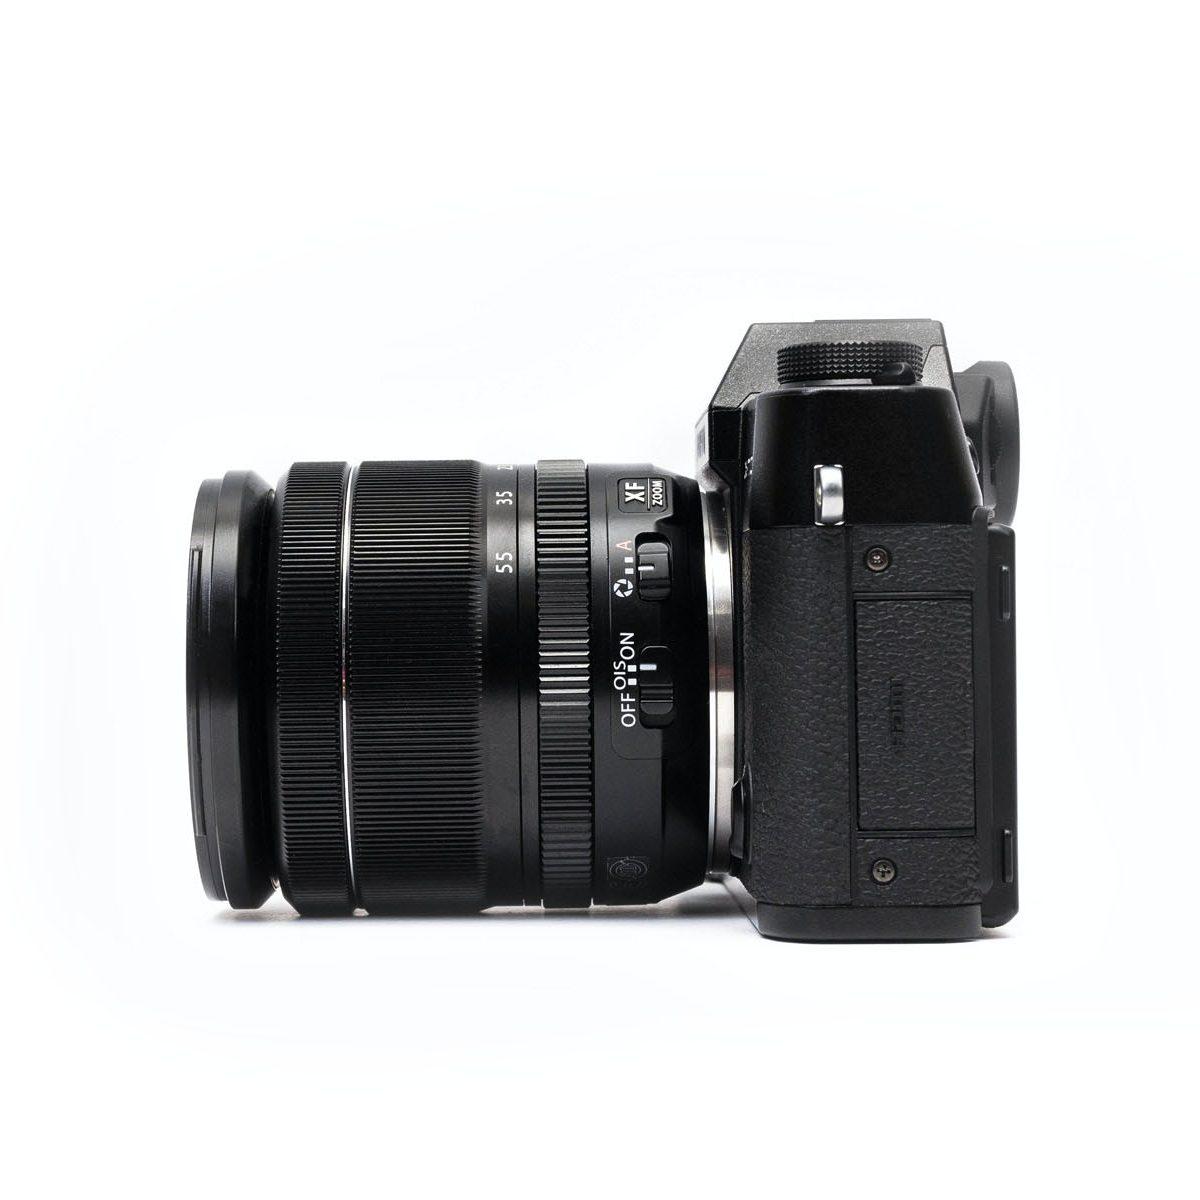 Fotokamera mit Objektiv